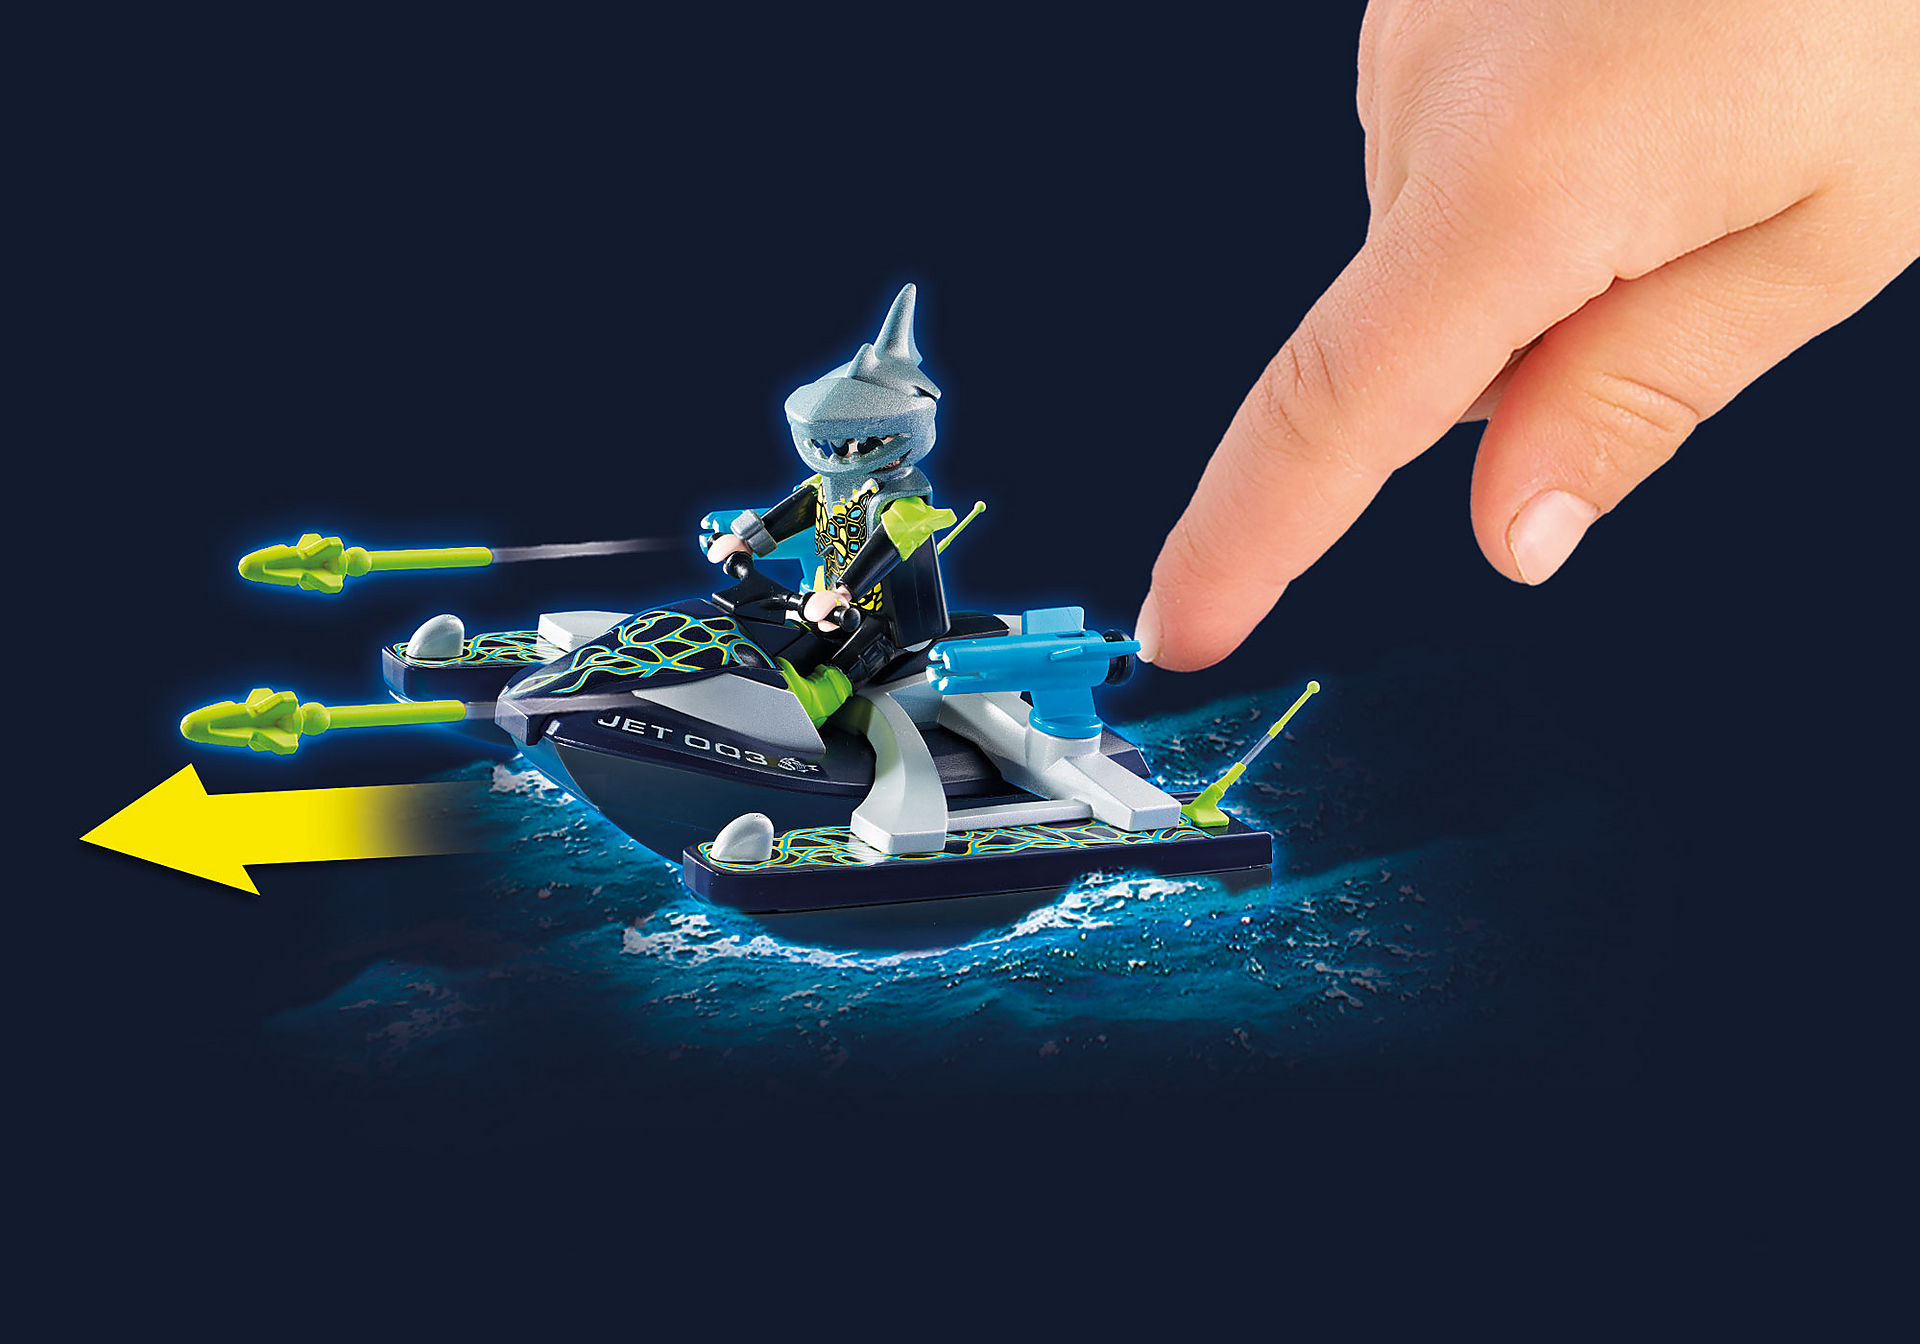 http://media.playmobil.com/i/playmobil/70007_product_extra1/TEAM S.H.A.R.K. Rocket Rafter